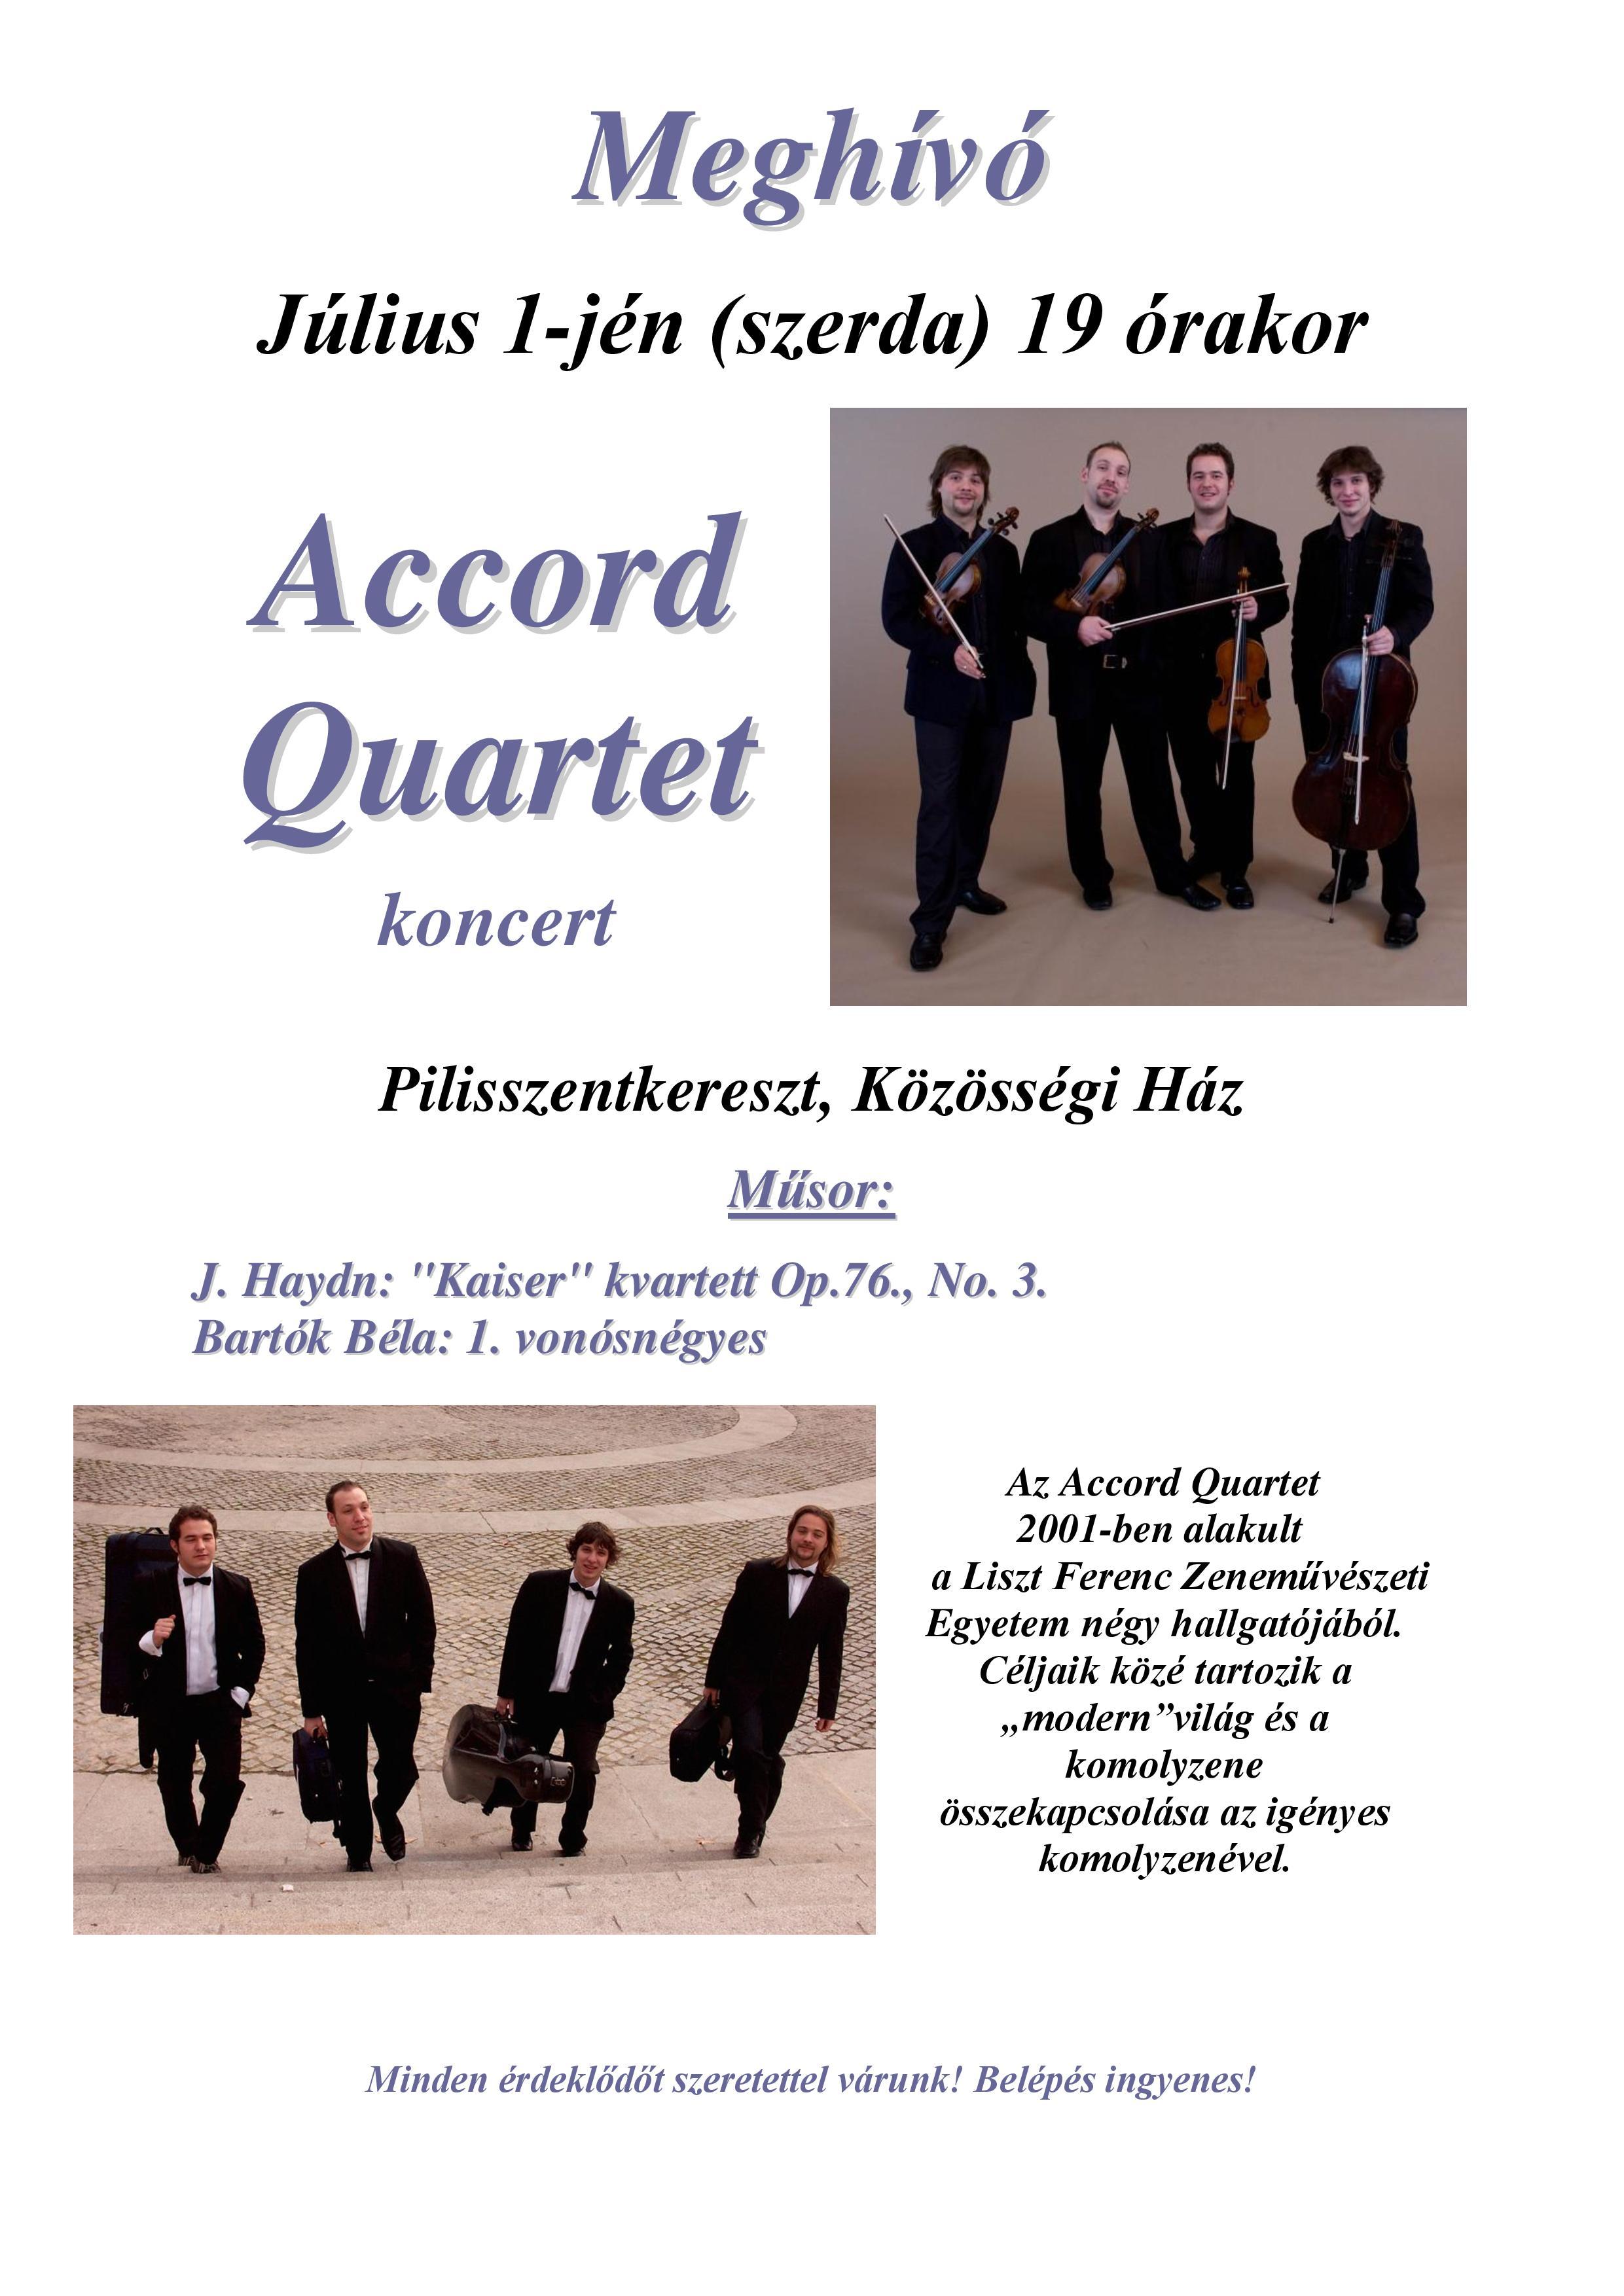 Accord Quartett koncert meghívó